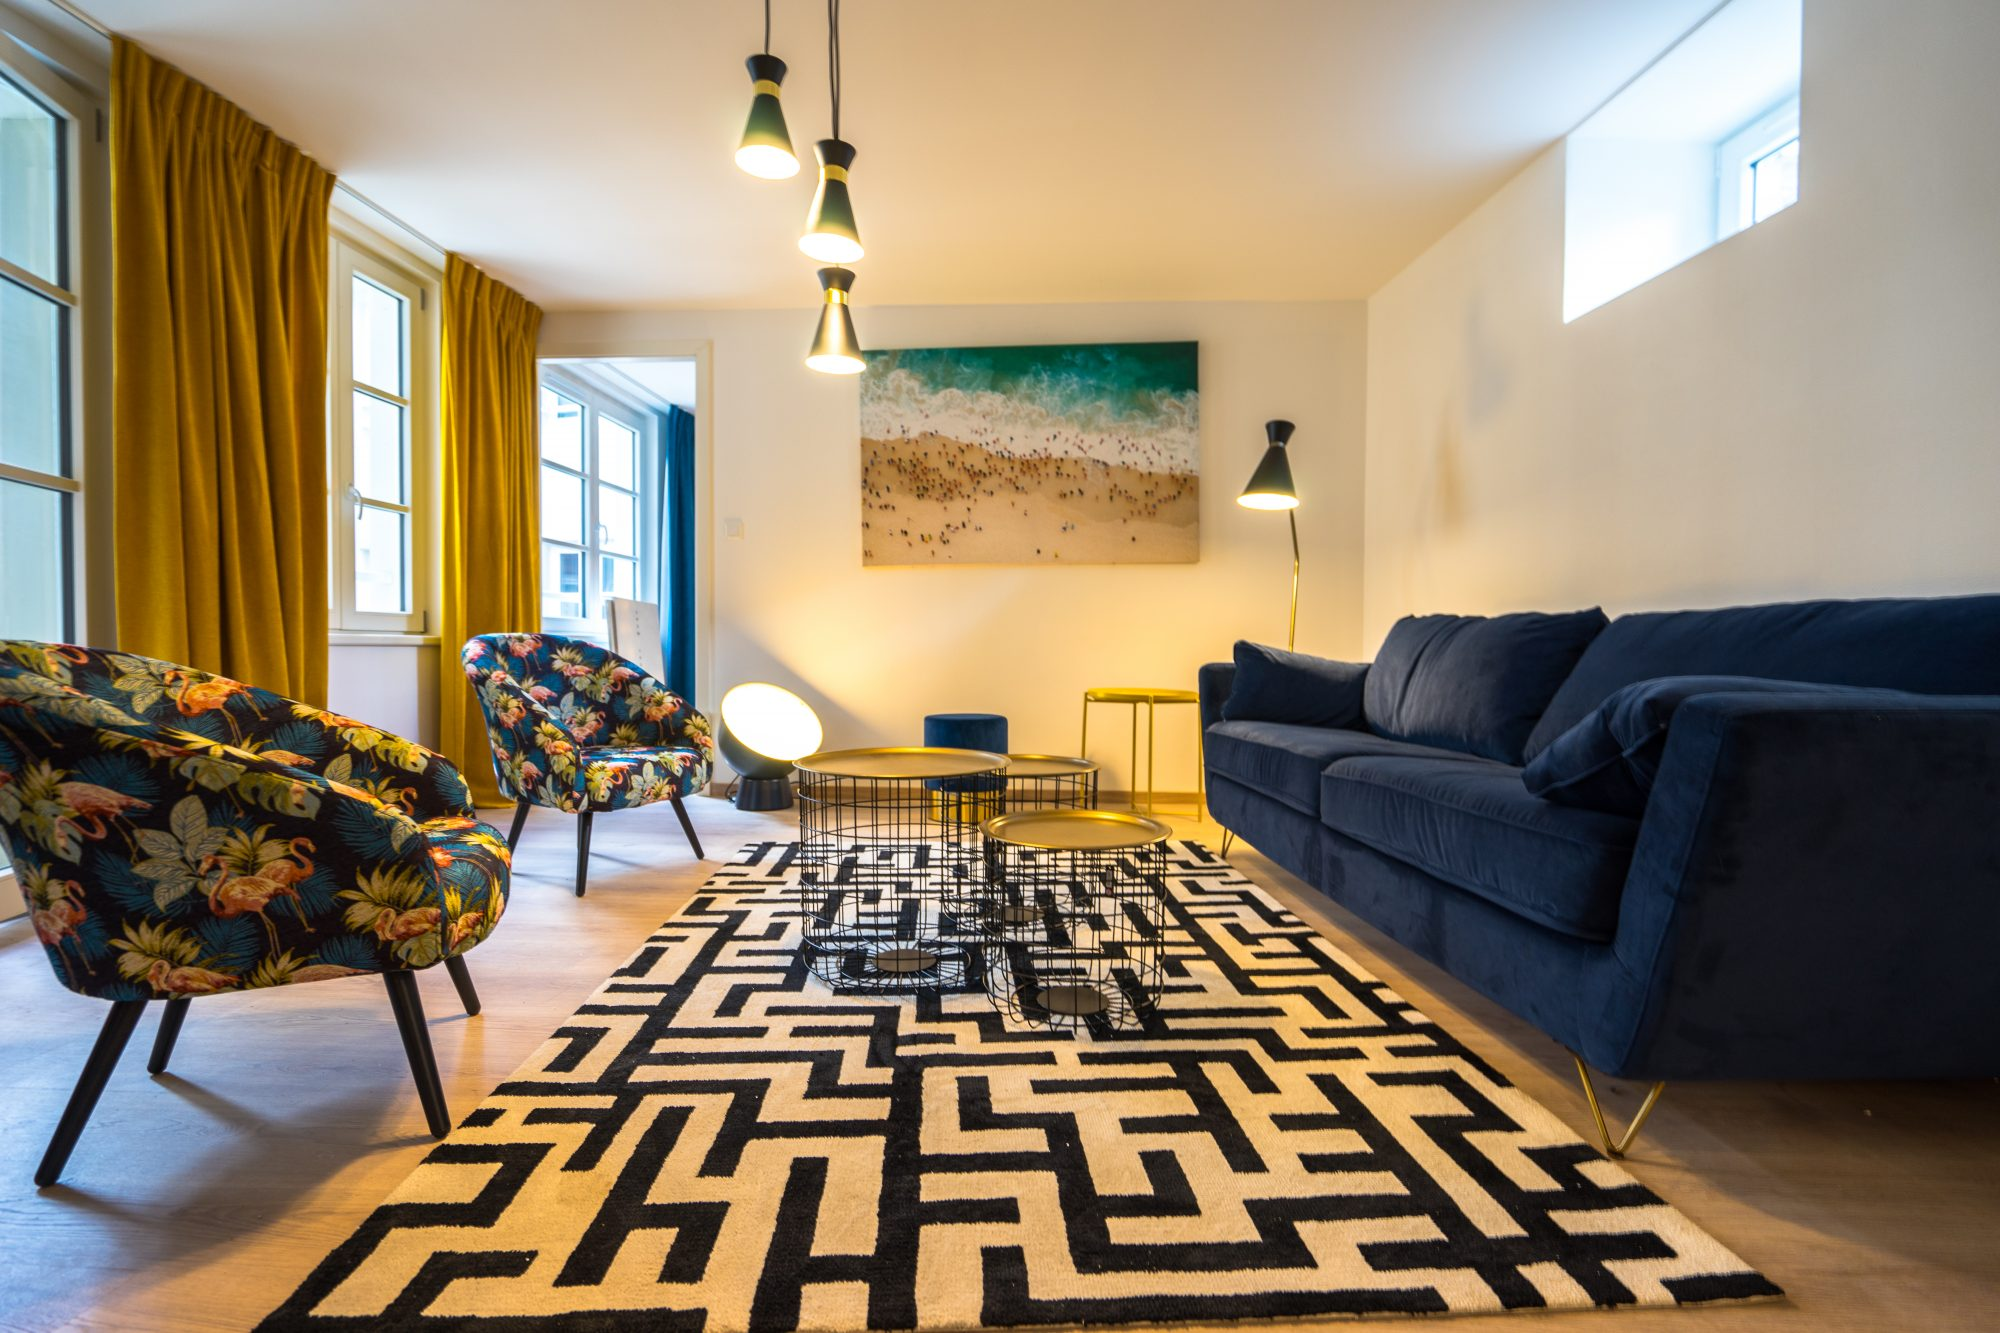 [Atypique] Splendide 2 pièces meublé avec terrasse – Petite France / quai Turckheim - nos locations - Beausite Immobilier 1